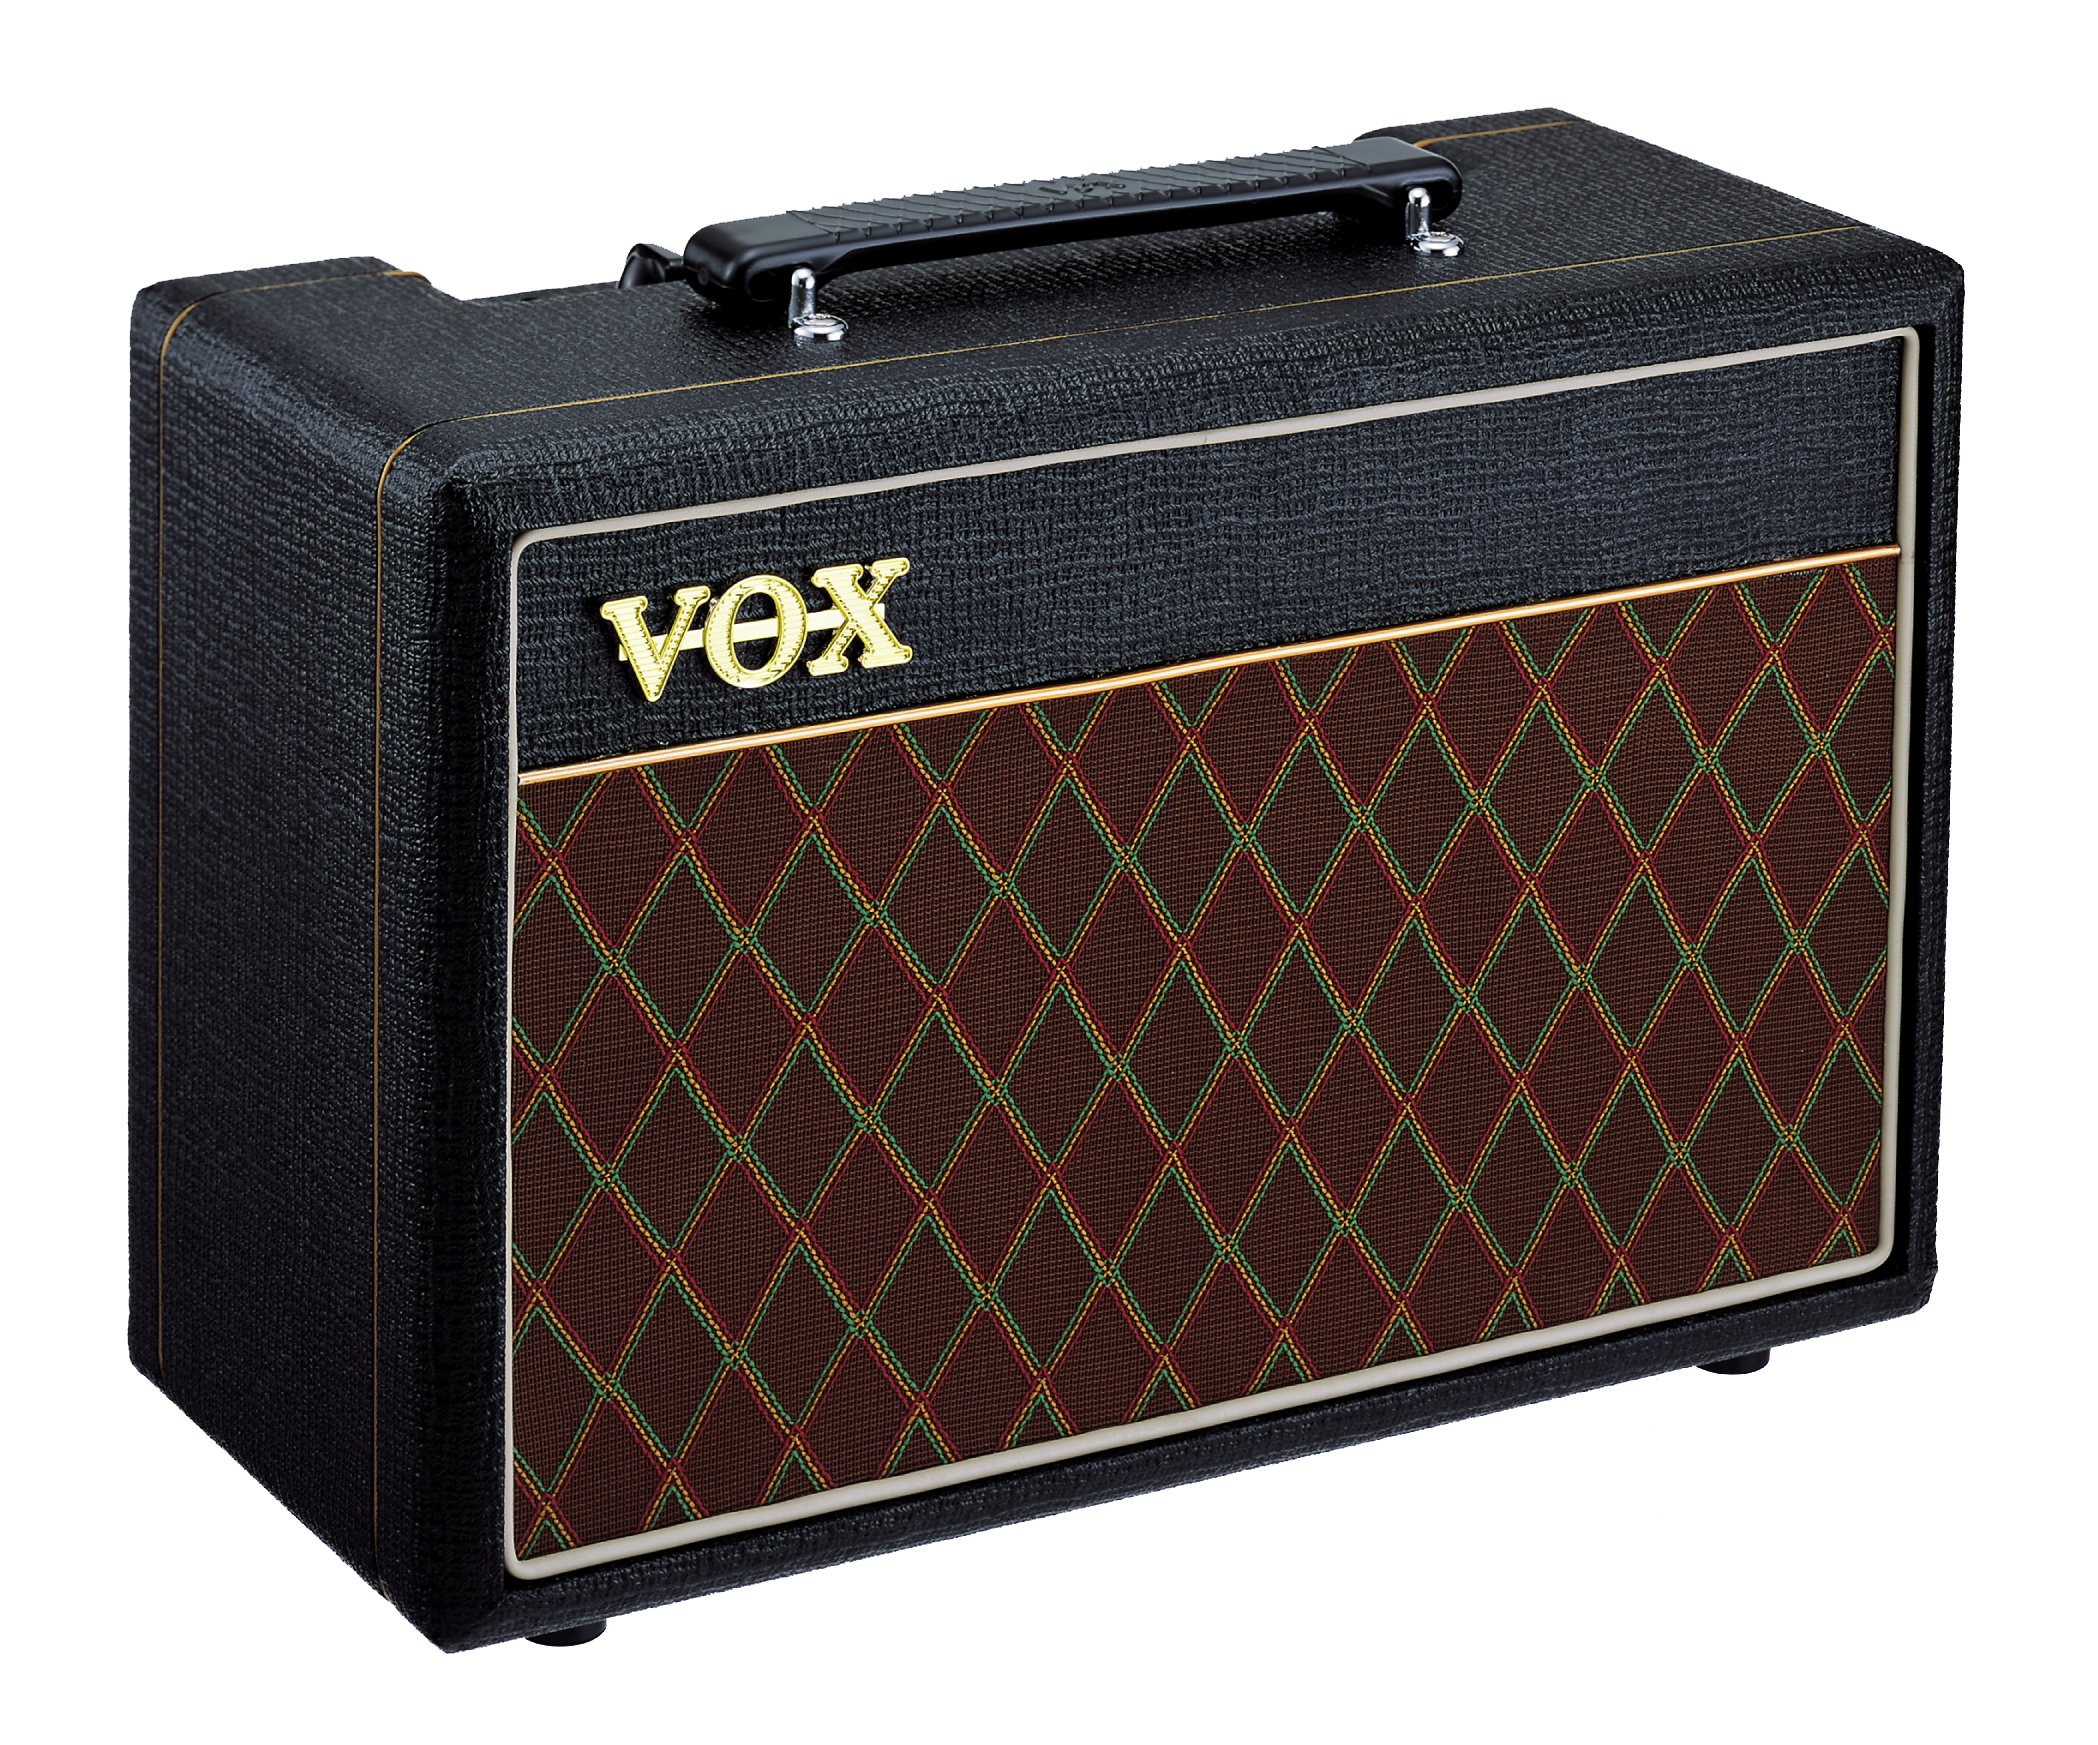 Pathfinder 10W Guitar Amplifier: Amplifier